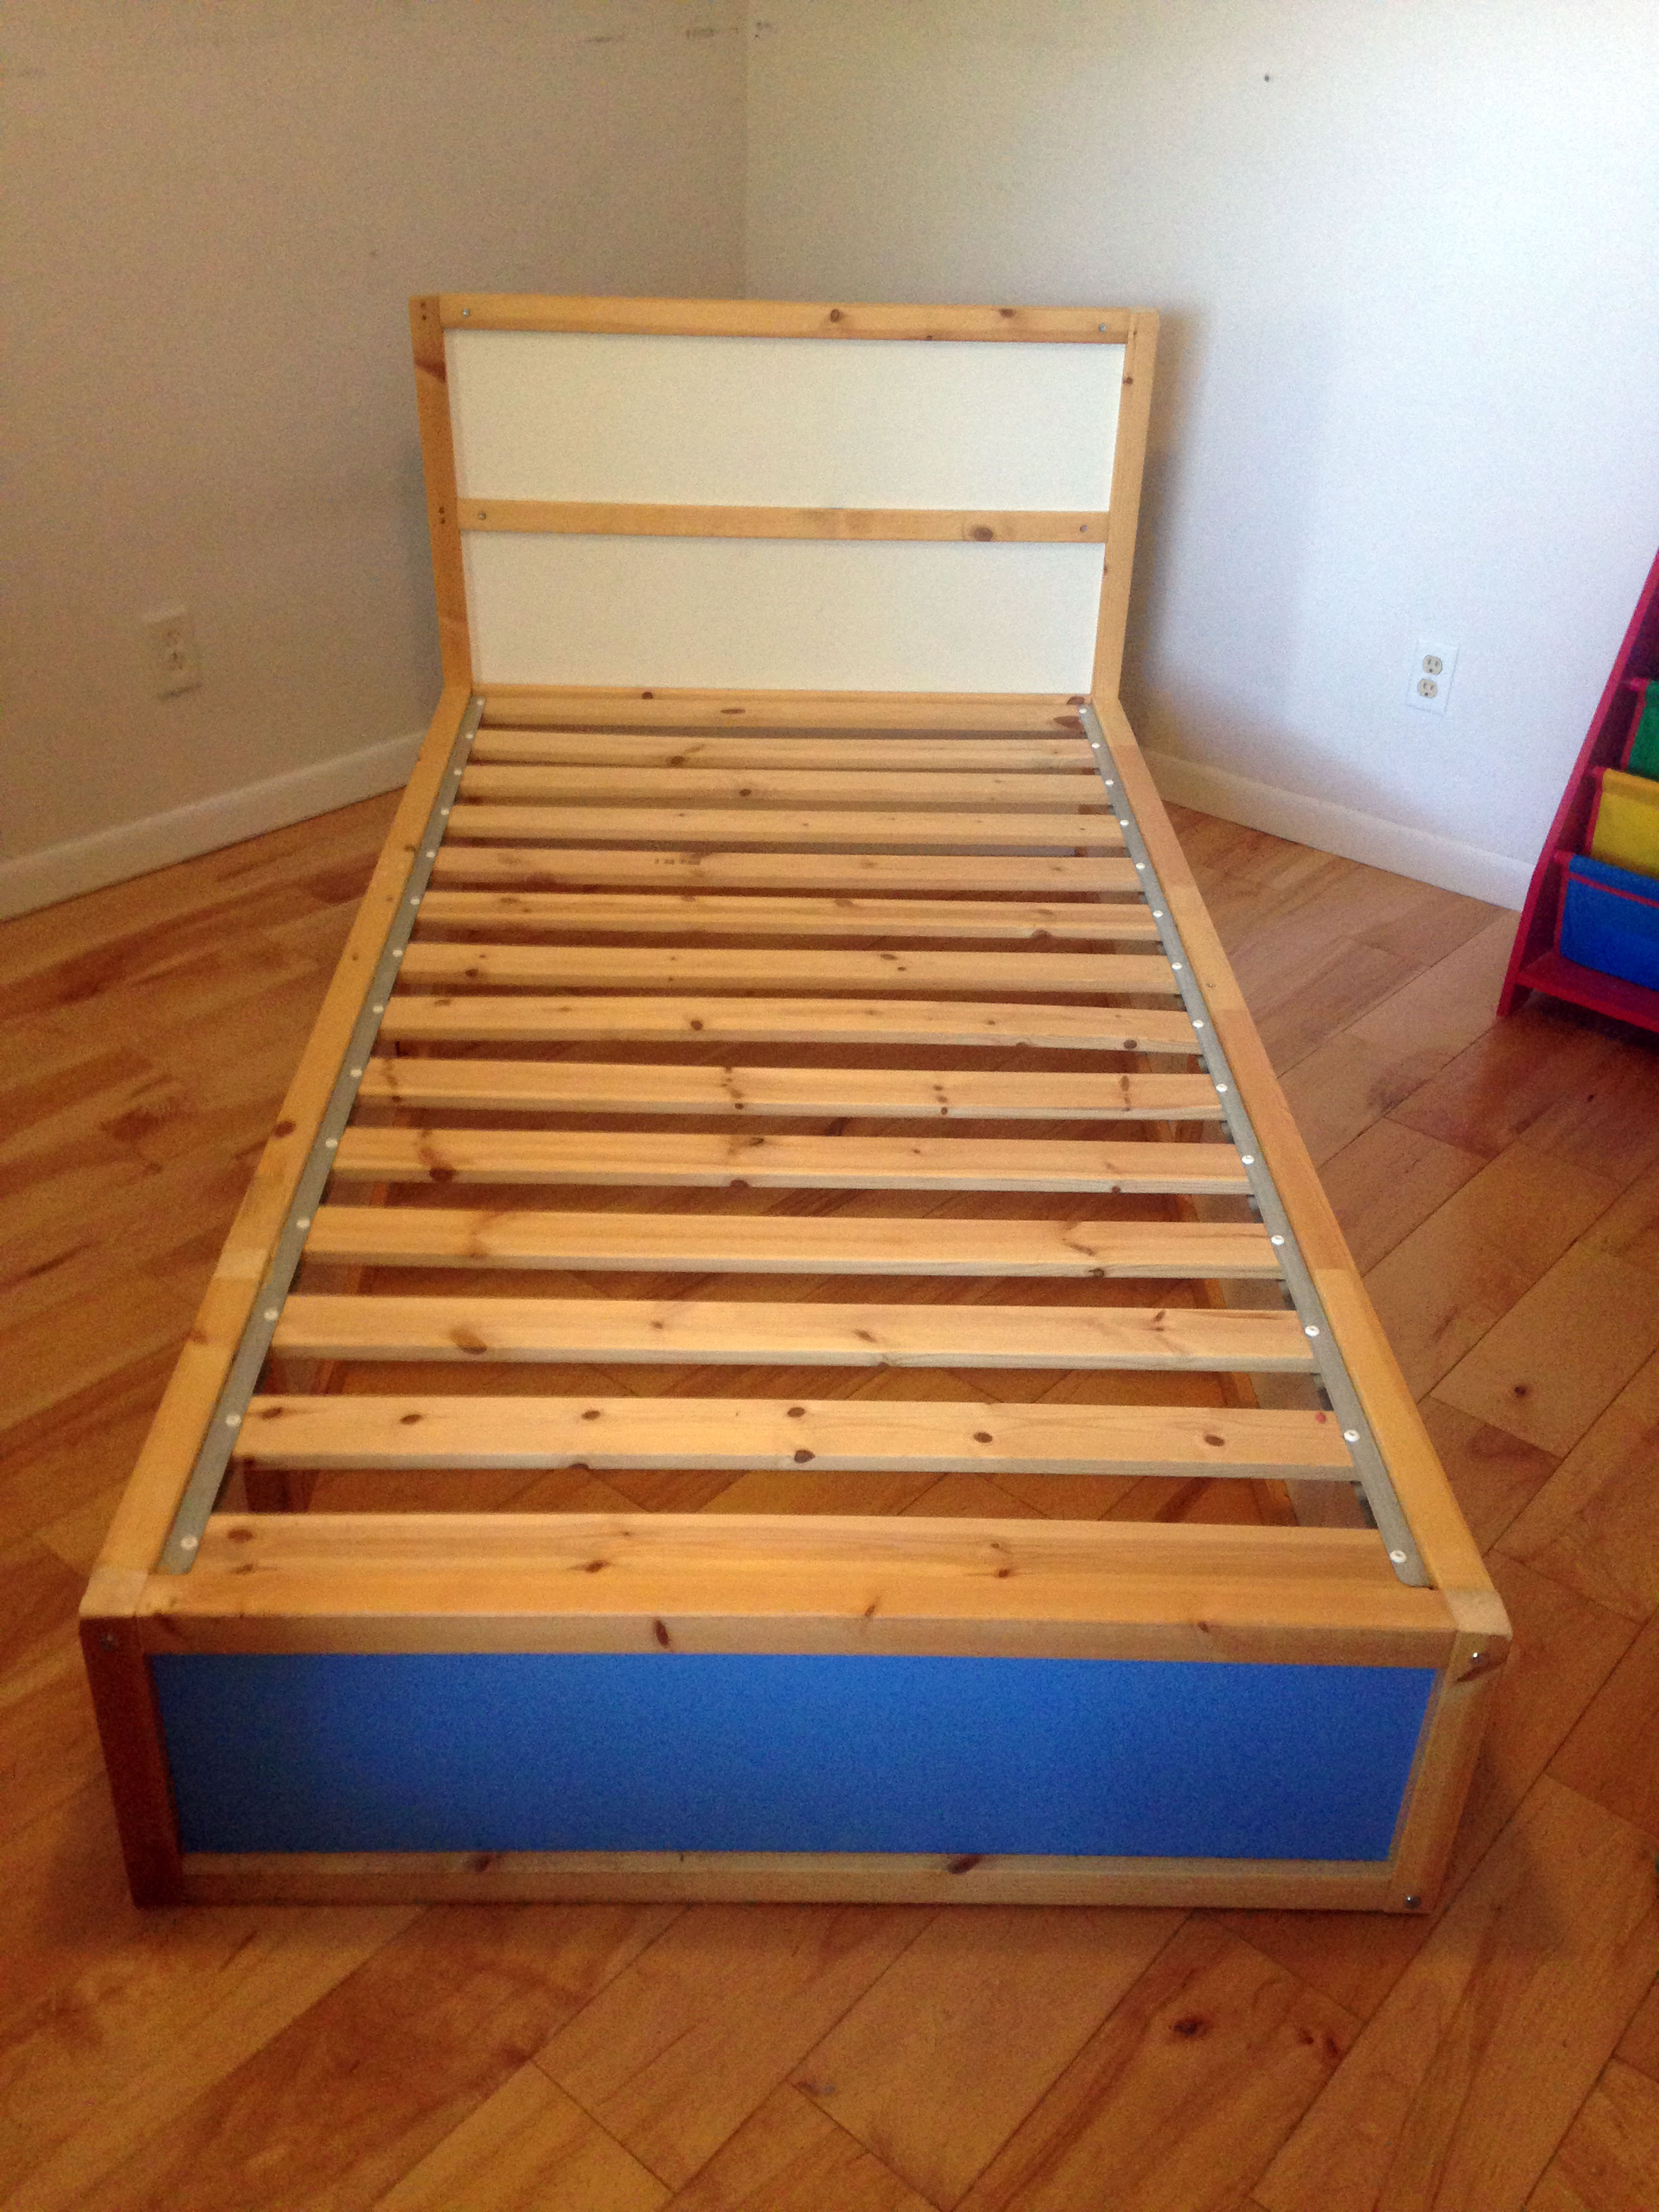 Usb Bed Save Money By Hacking An Ikea Kura Bed Jennifer